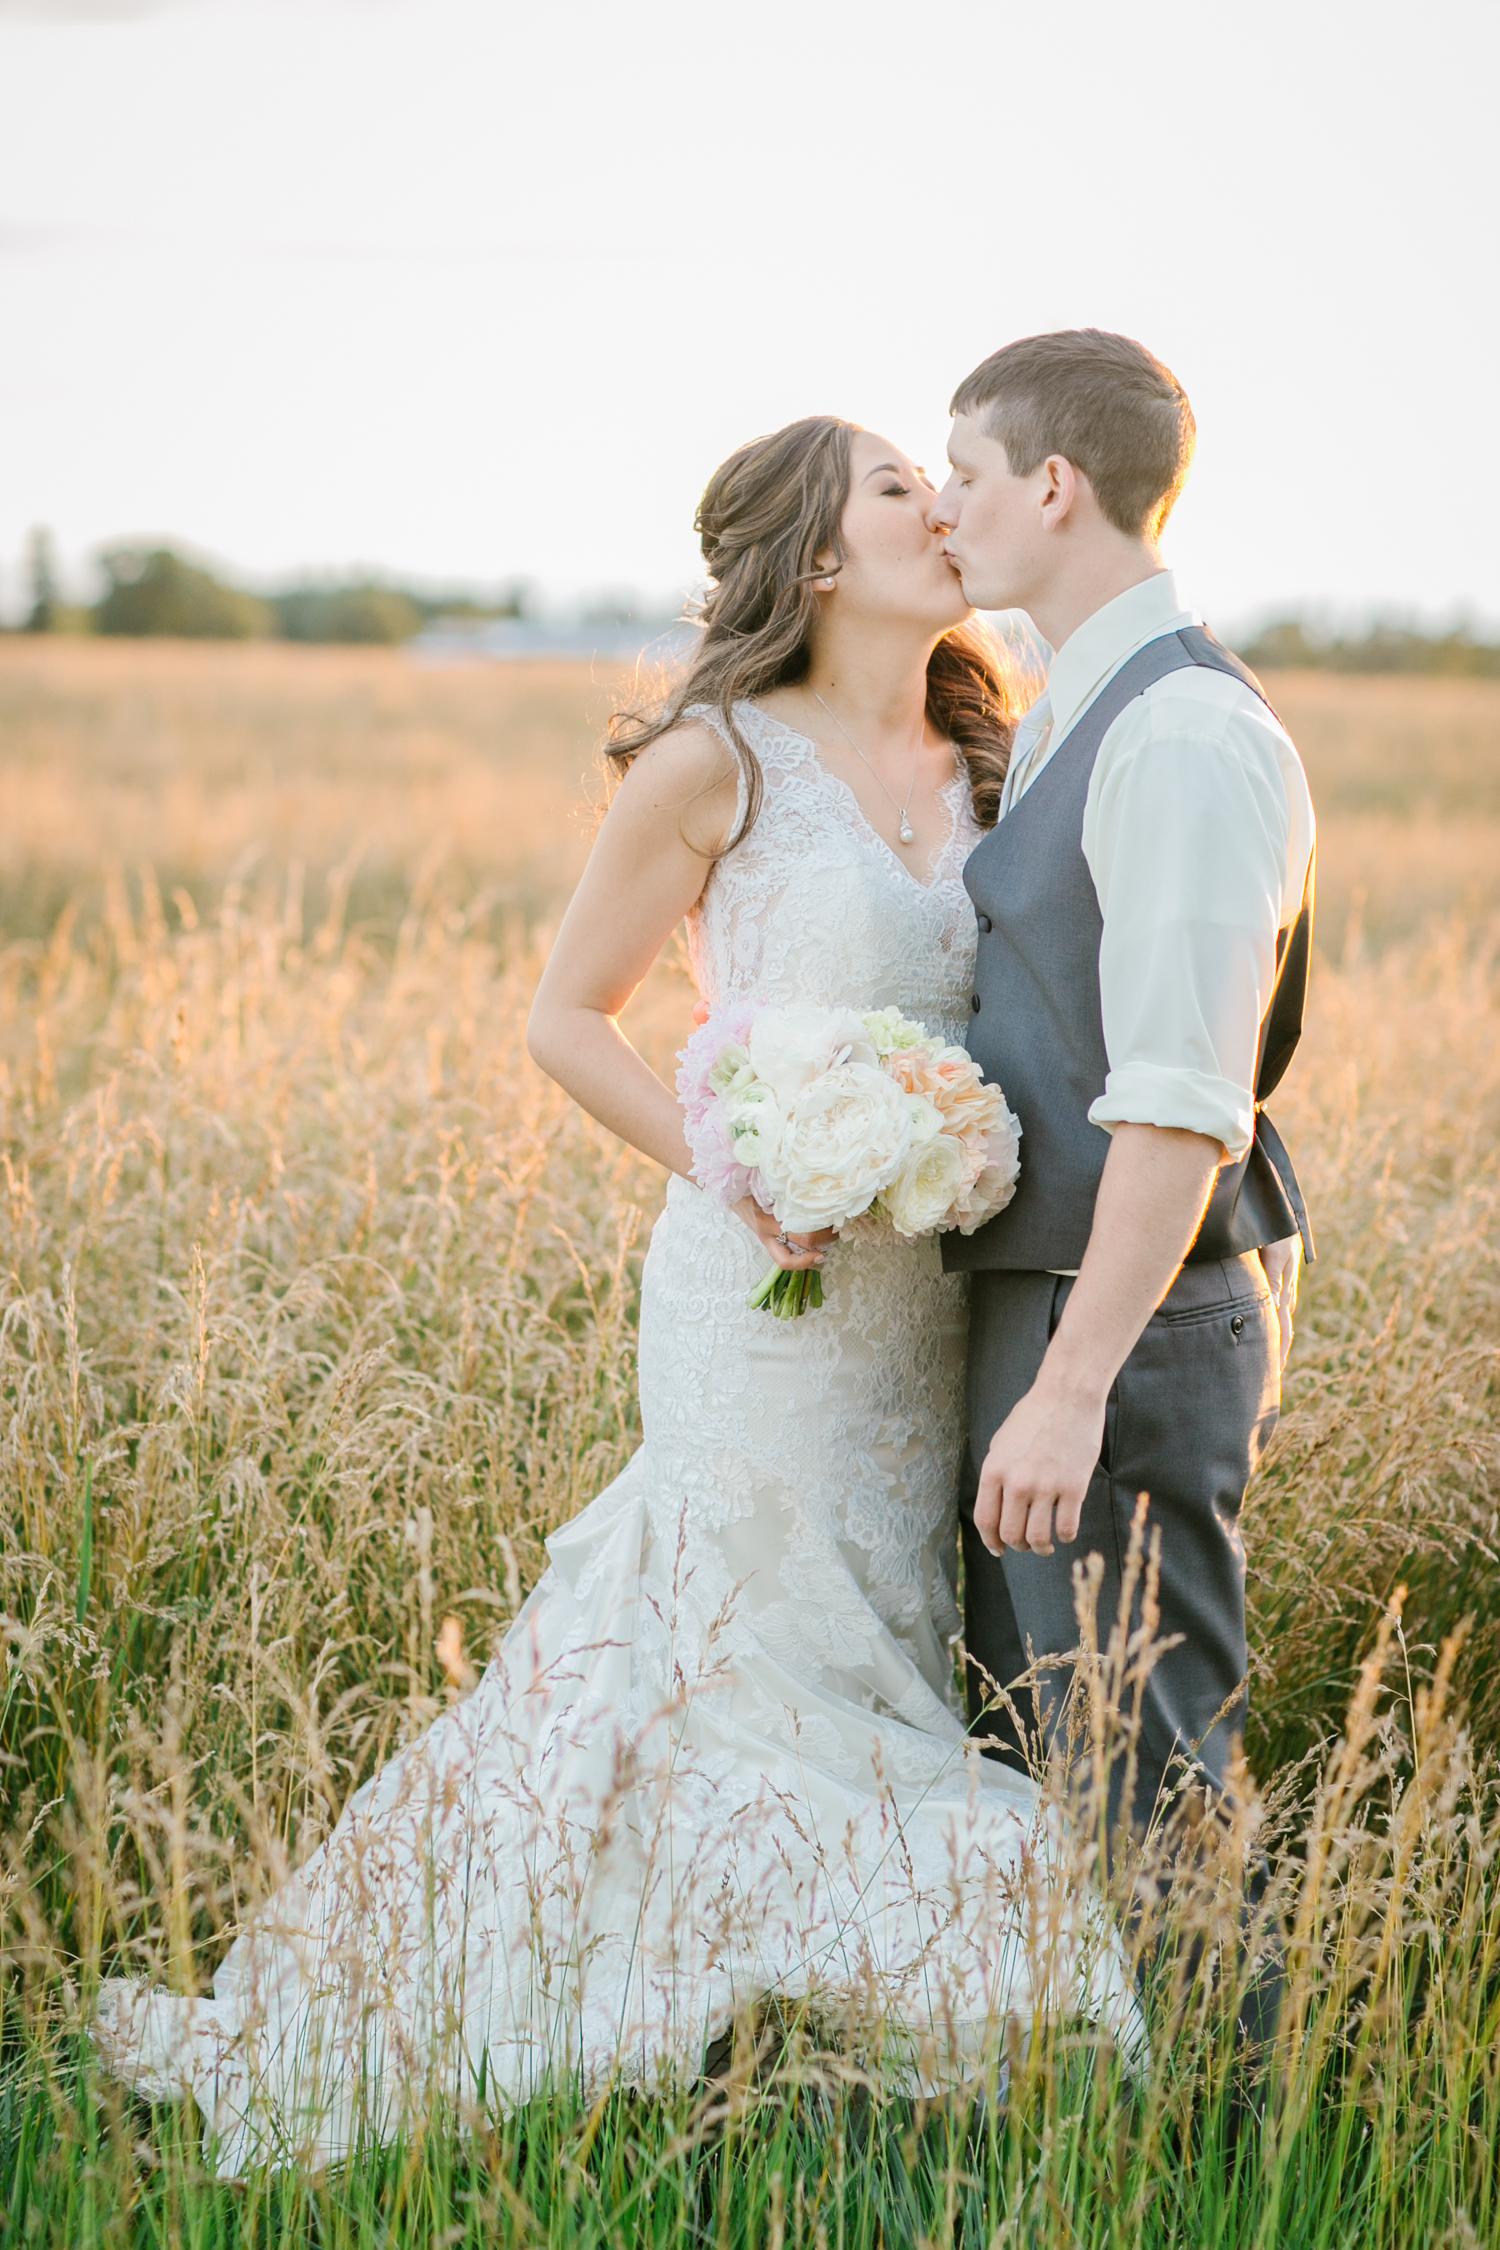 Postlewaits Oregon Wedding by Michelle Cross-63.jpg